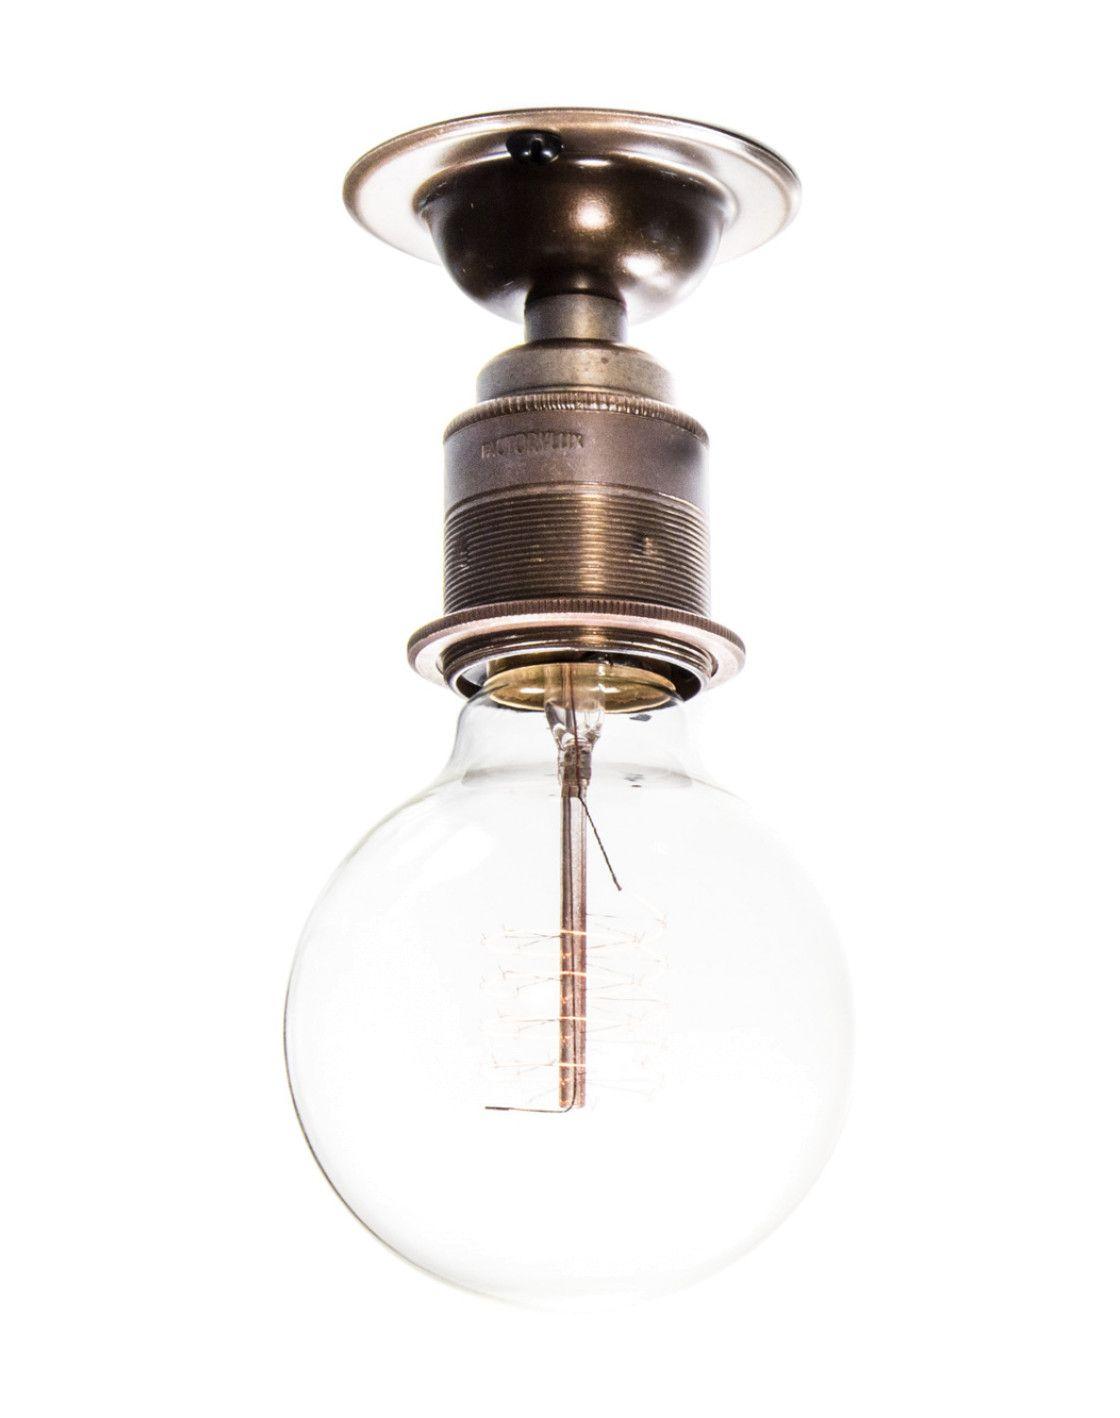 Maria Small Factory Light Brass Factory Lighting Vintage Ceiling Lights Ceiling Lights Uk